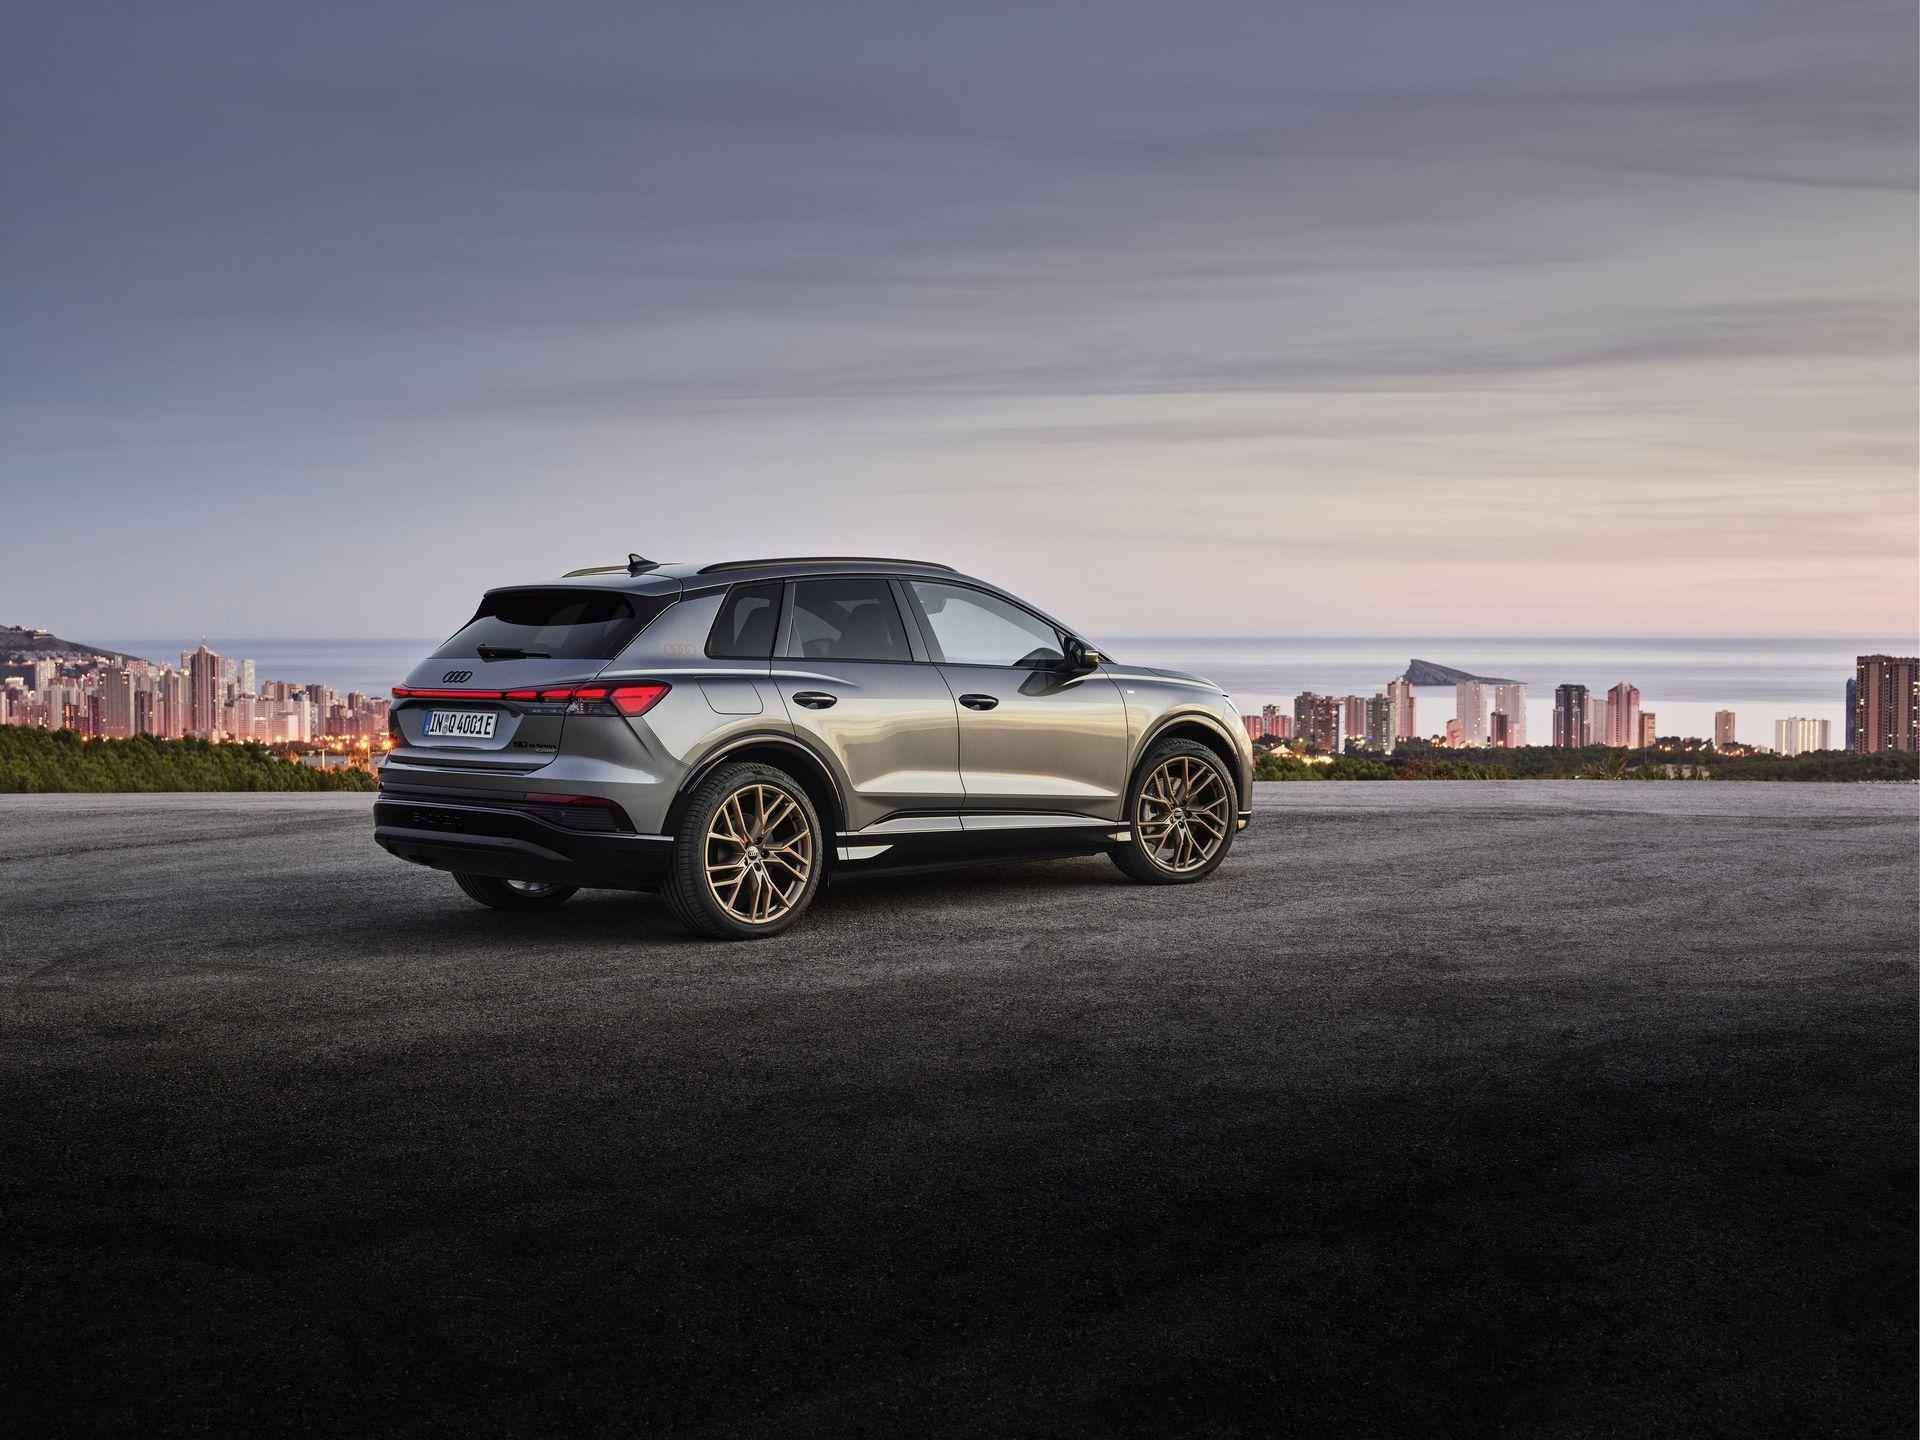 Audi-Q4-e-tron-and-Q4-e-tron-Sportback-46